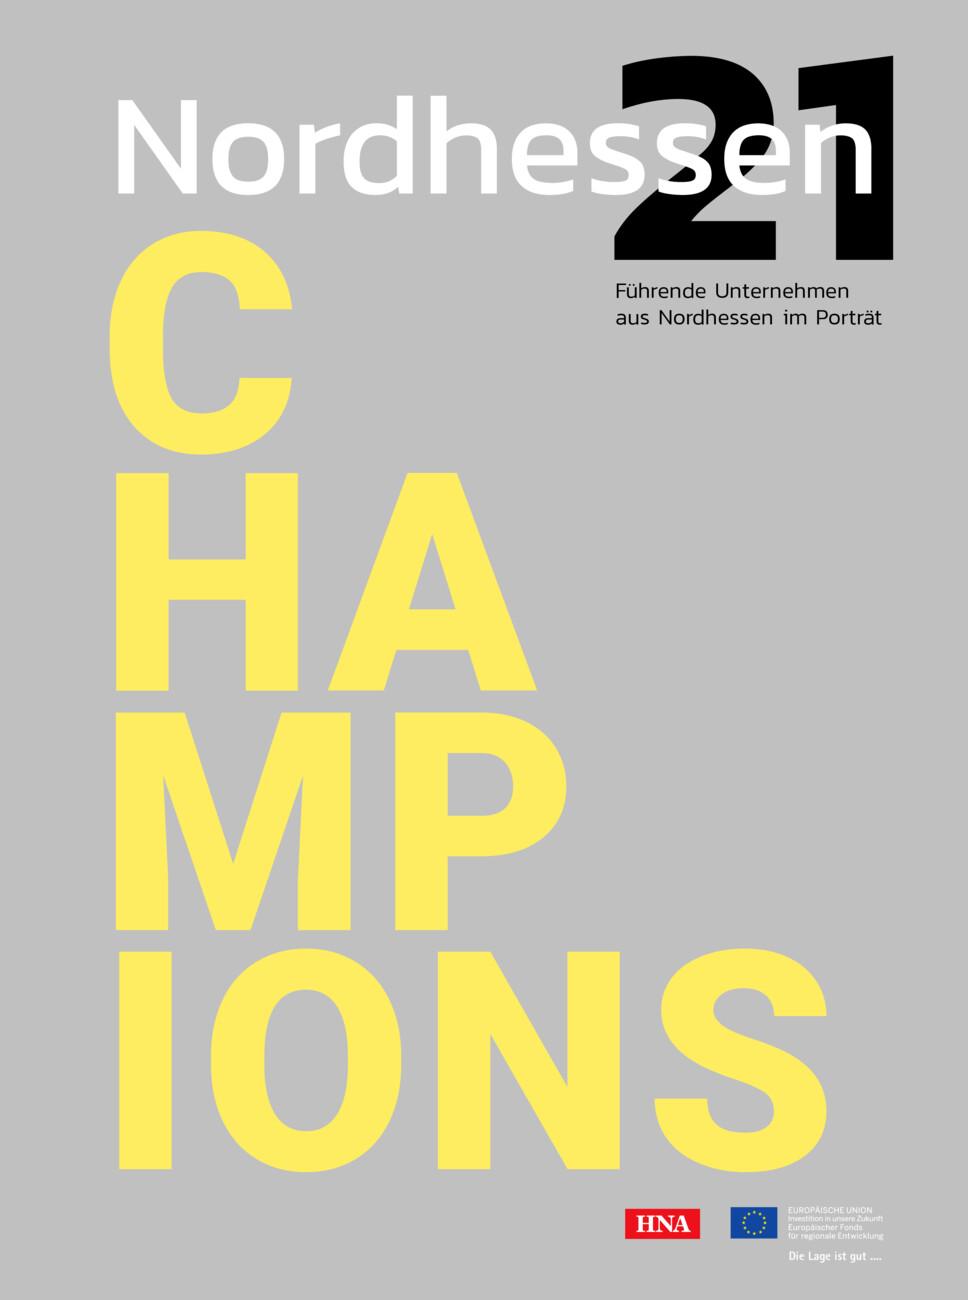 Nordhessen Champions 2021 vom Freitag, 27.08.2021